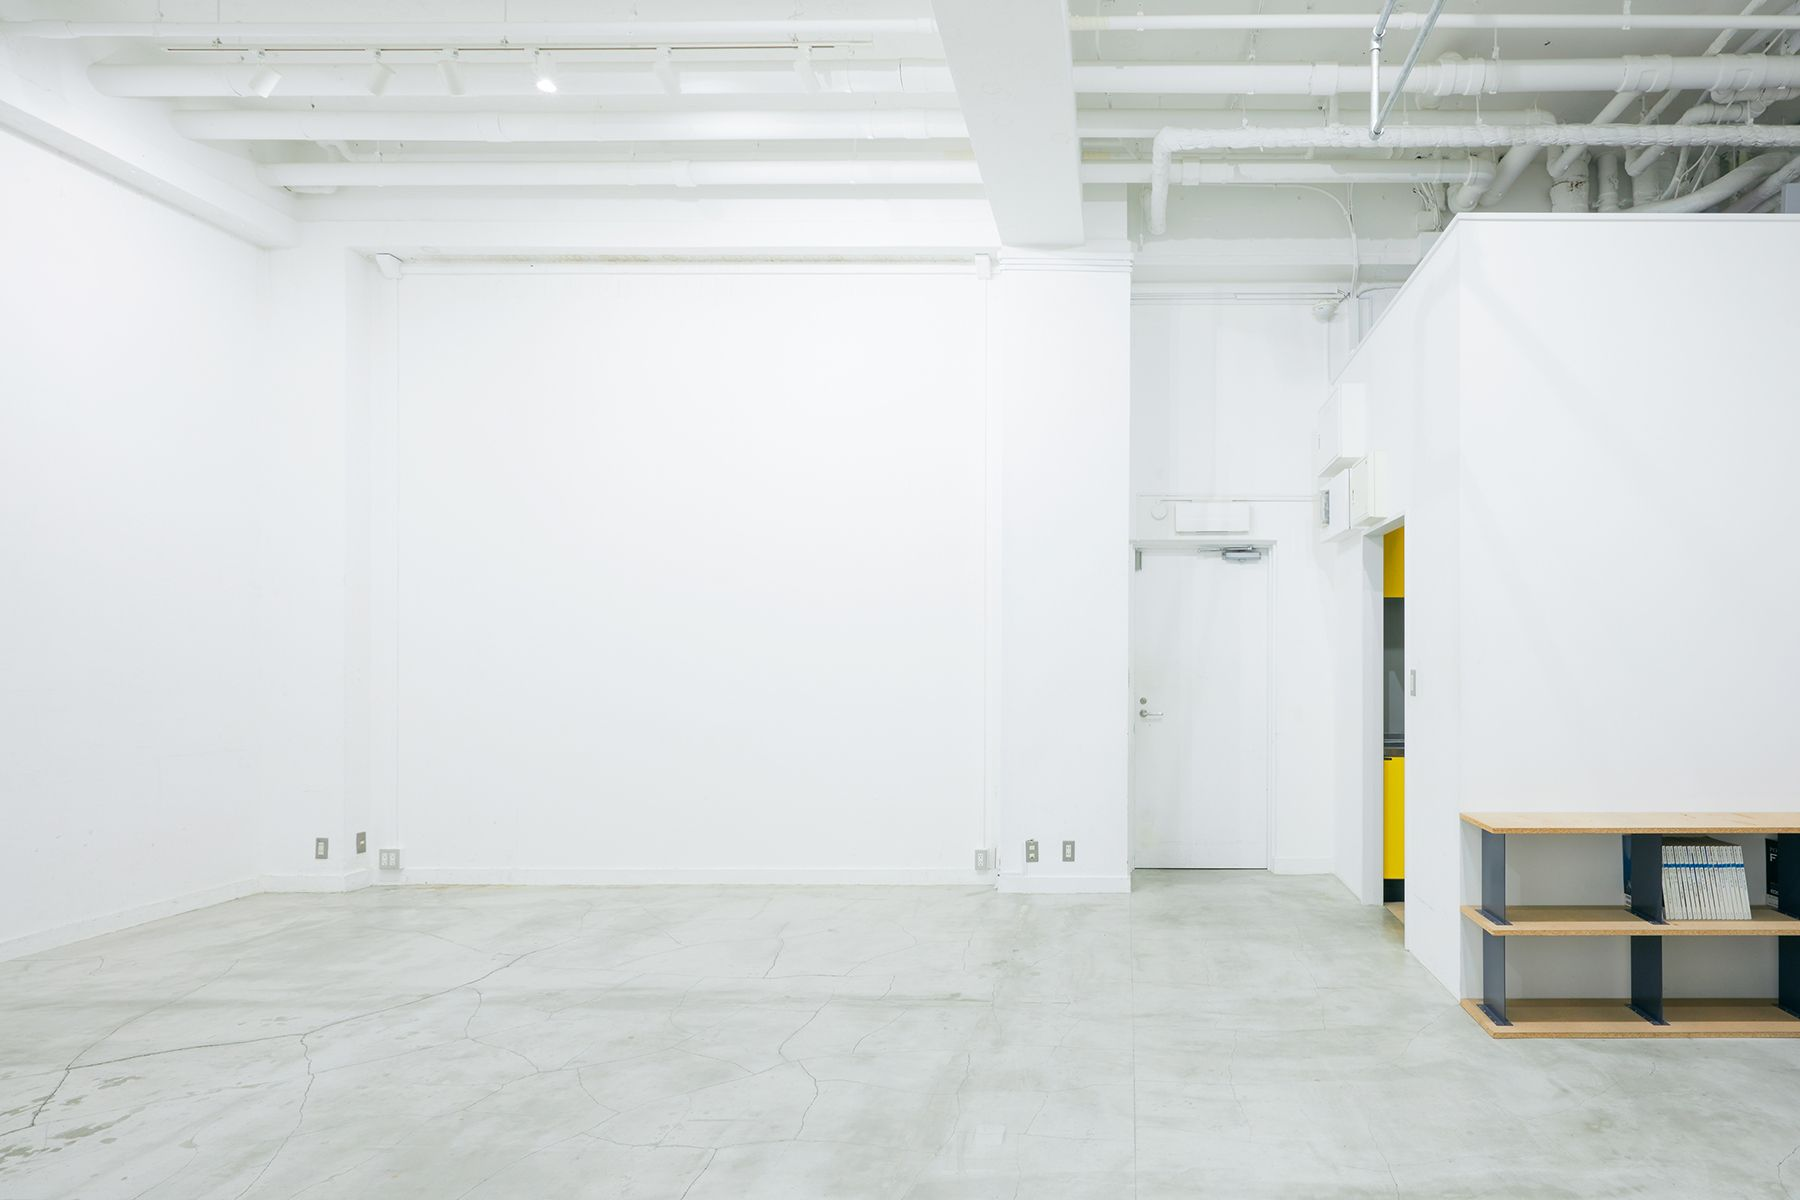 sinca studio 中野坂上 (シンカ スタジオ)スタジオマンは常駐してません